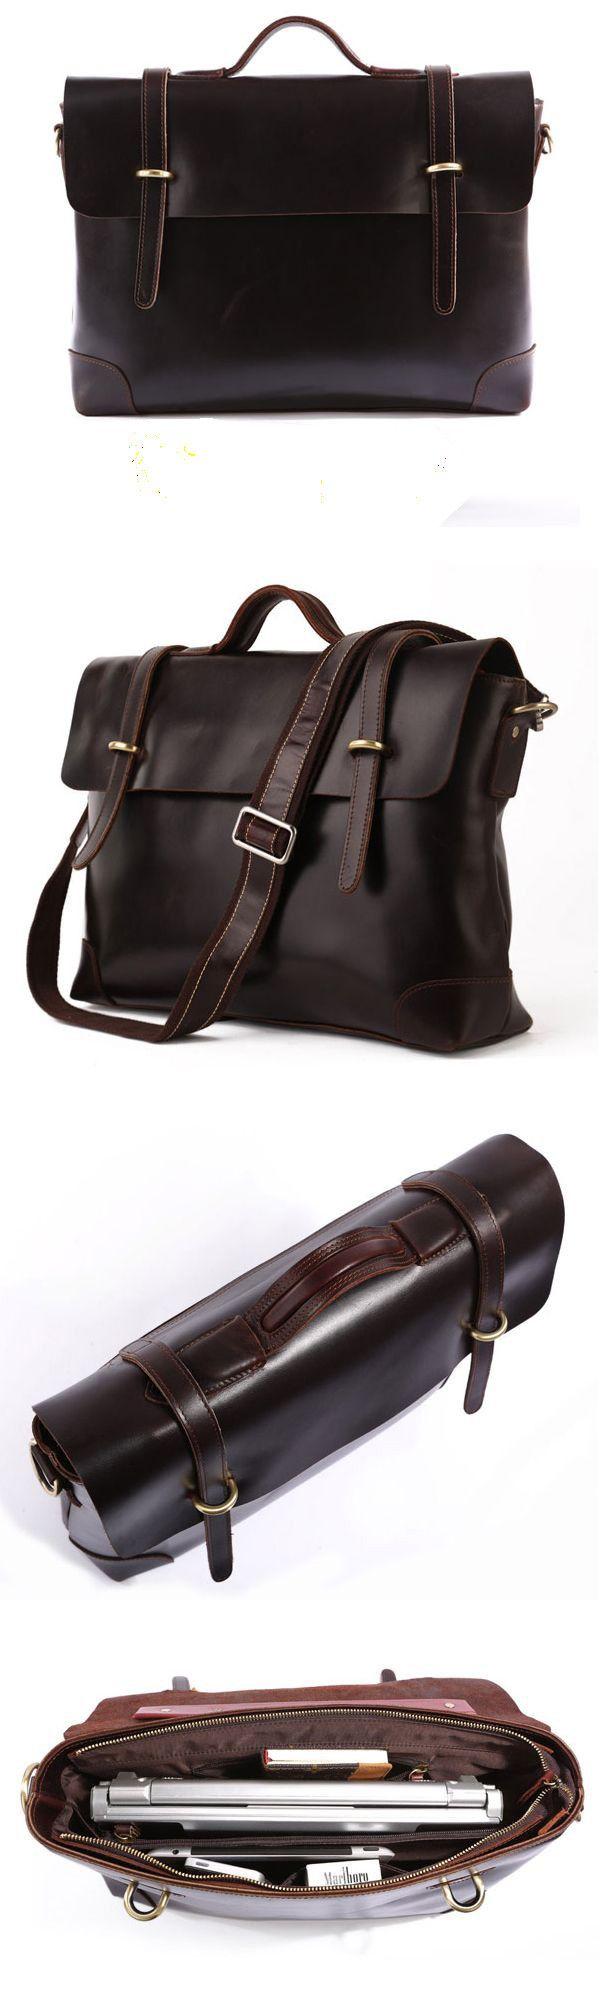 Selvaggio #Leather #Messenger Bag #Briefcase